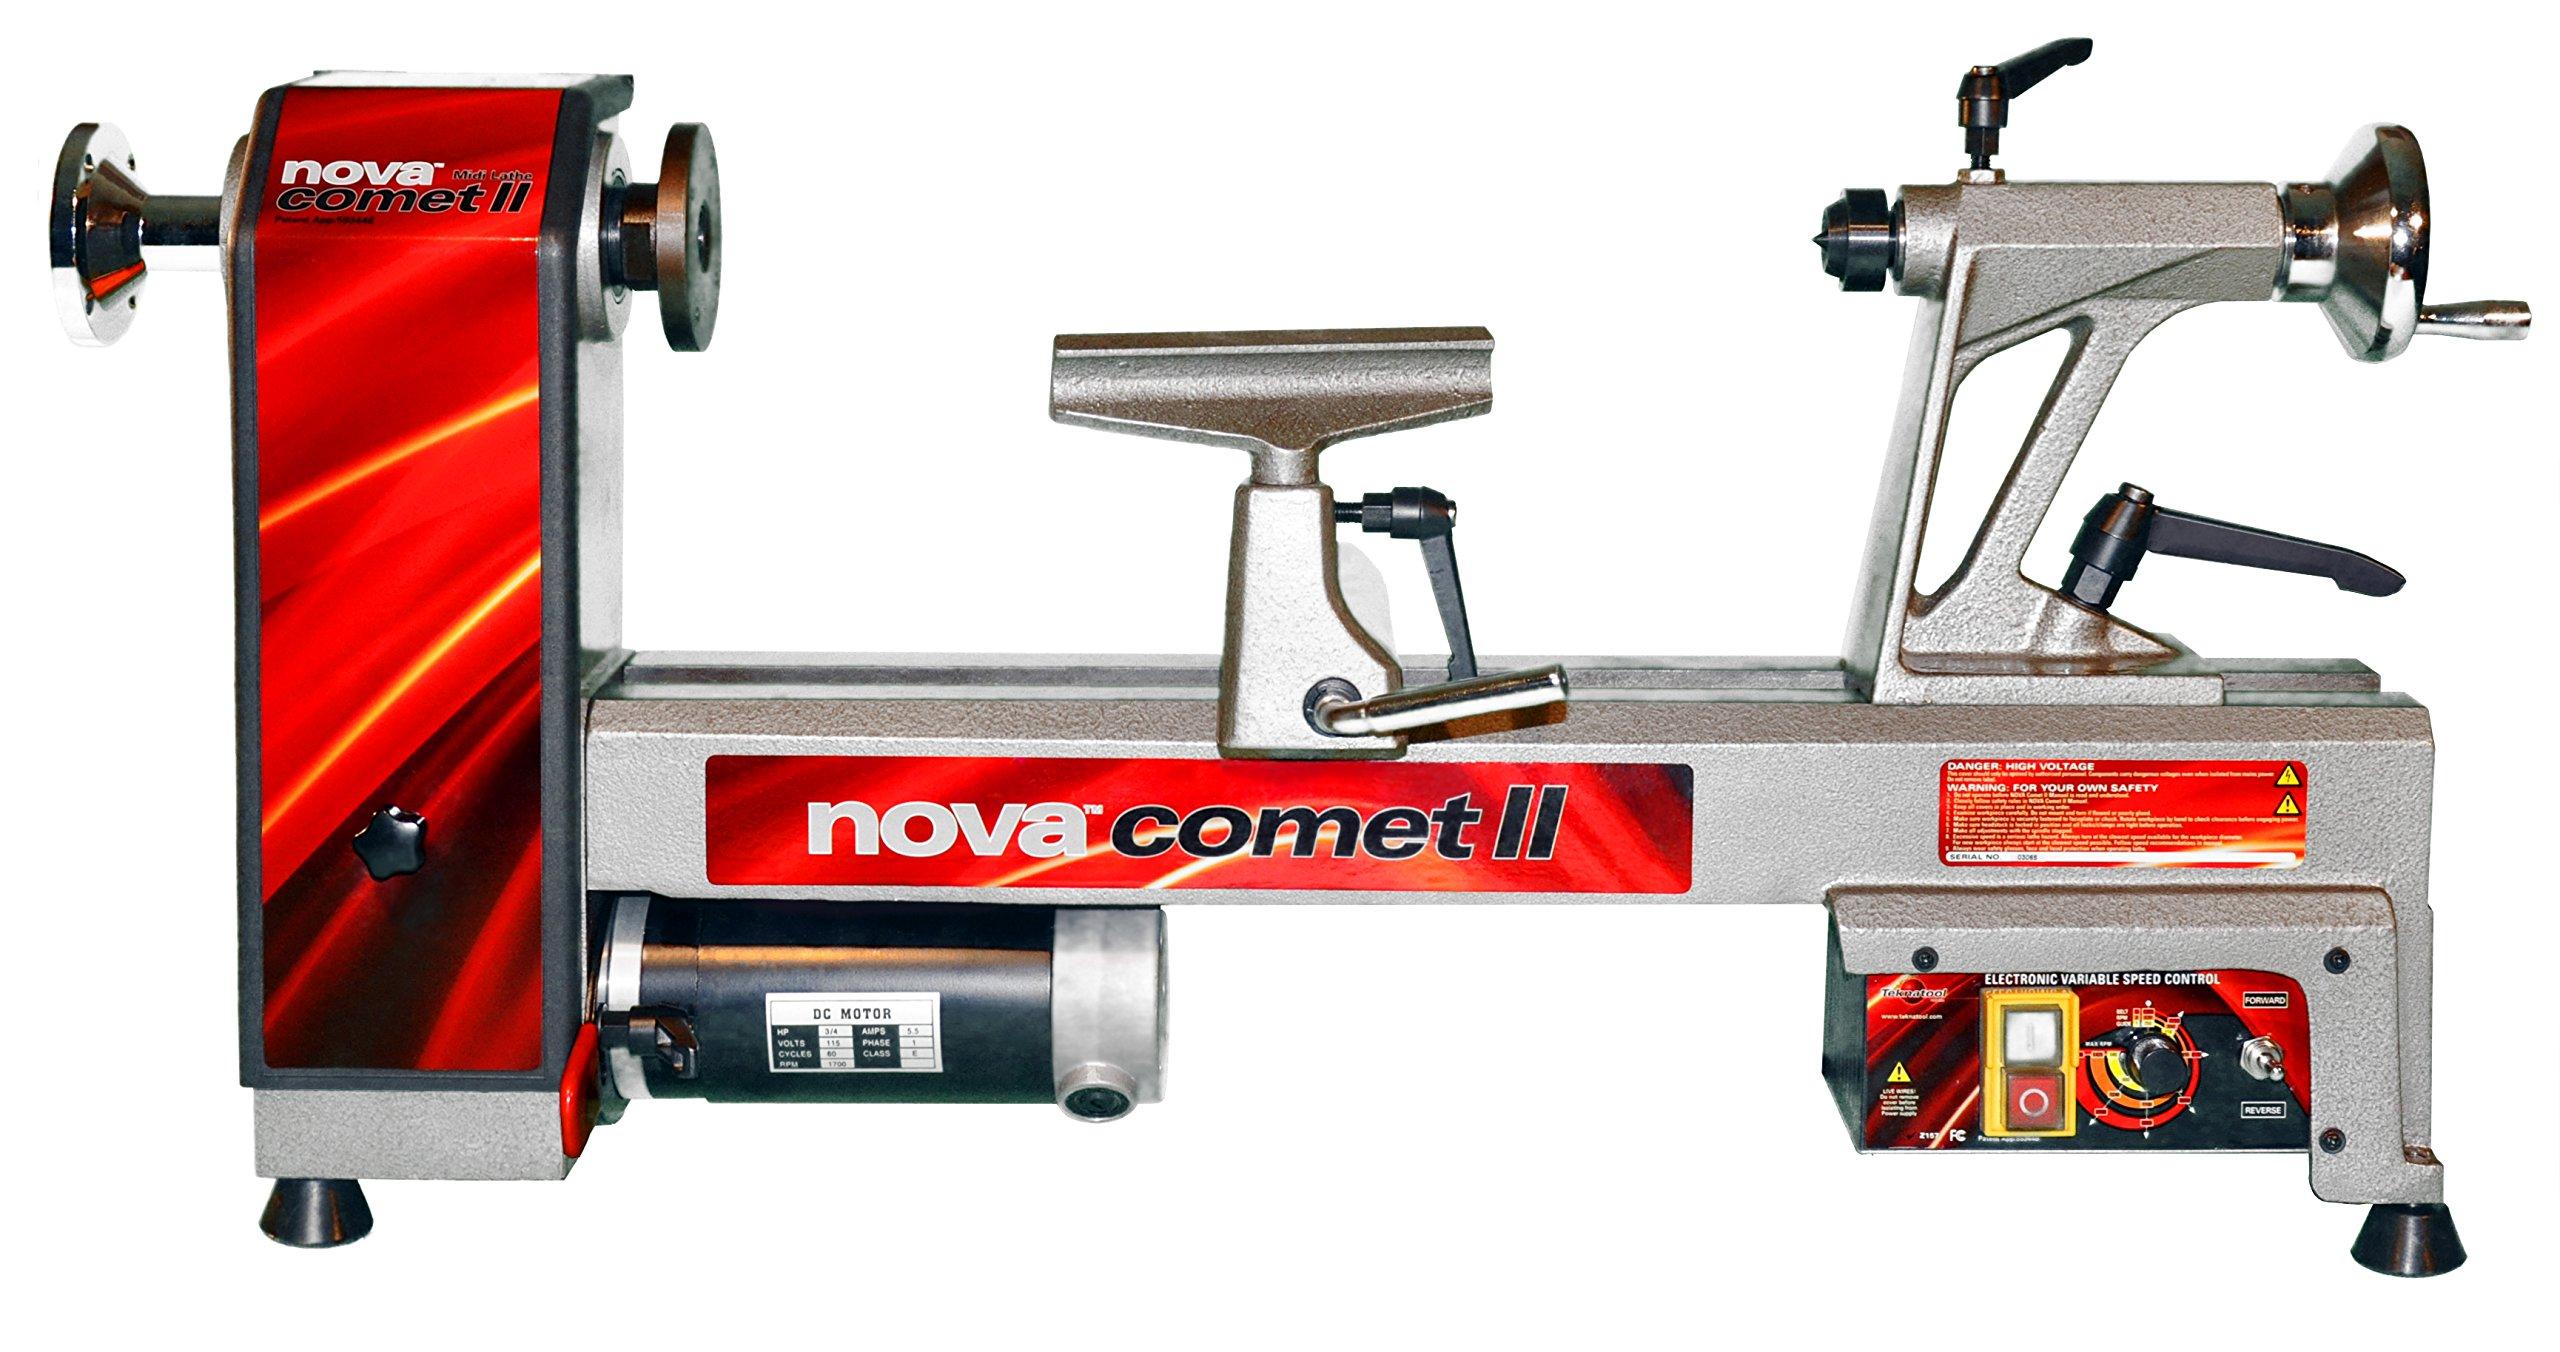 NOVA 46300 Comet II Variable Speed Mini Lathe 12-Inch x 16 1/2-Inch by Nova